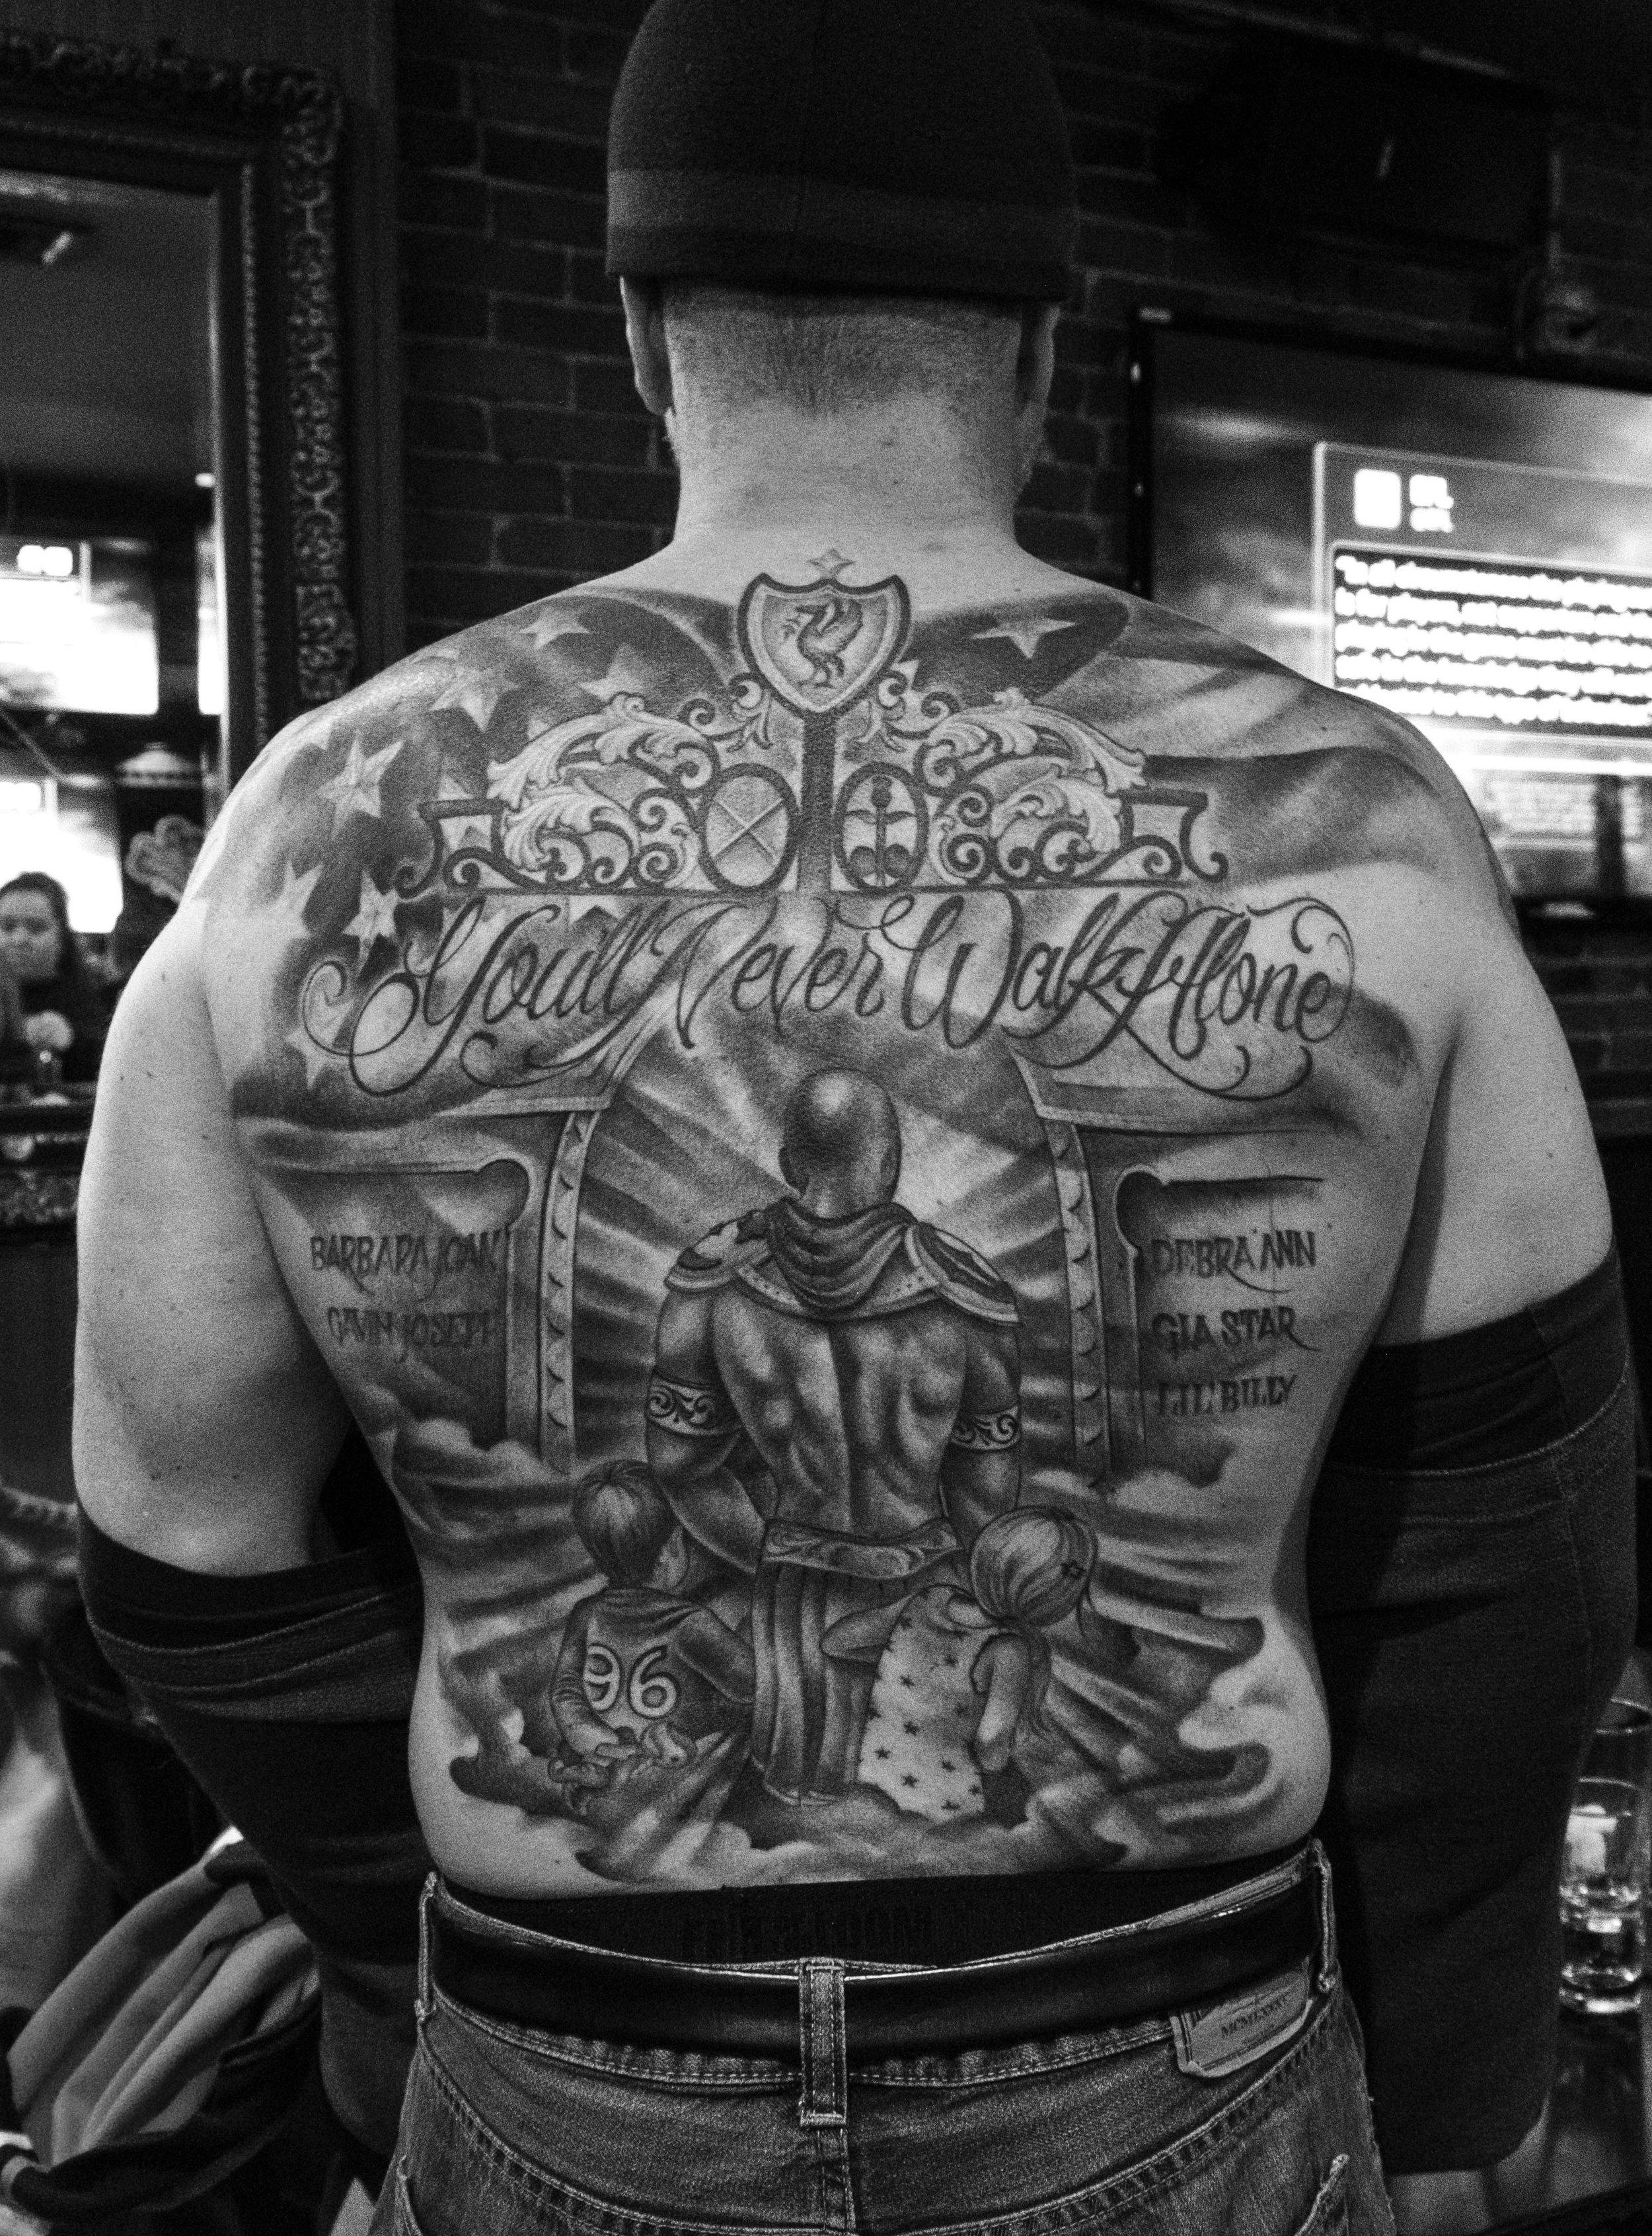 janette-beckman-liverpool-tattoos-supporters-ynwa.jpg